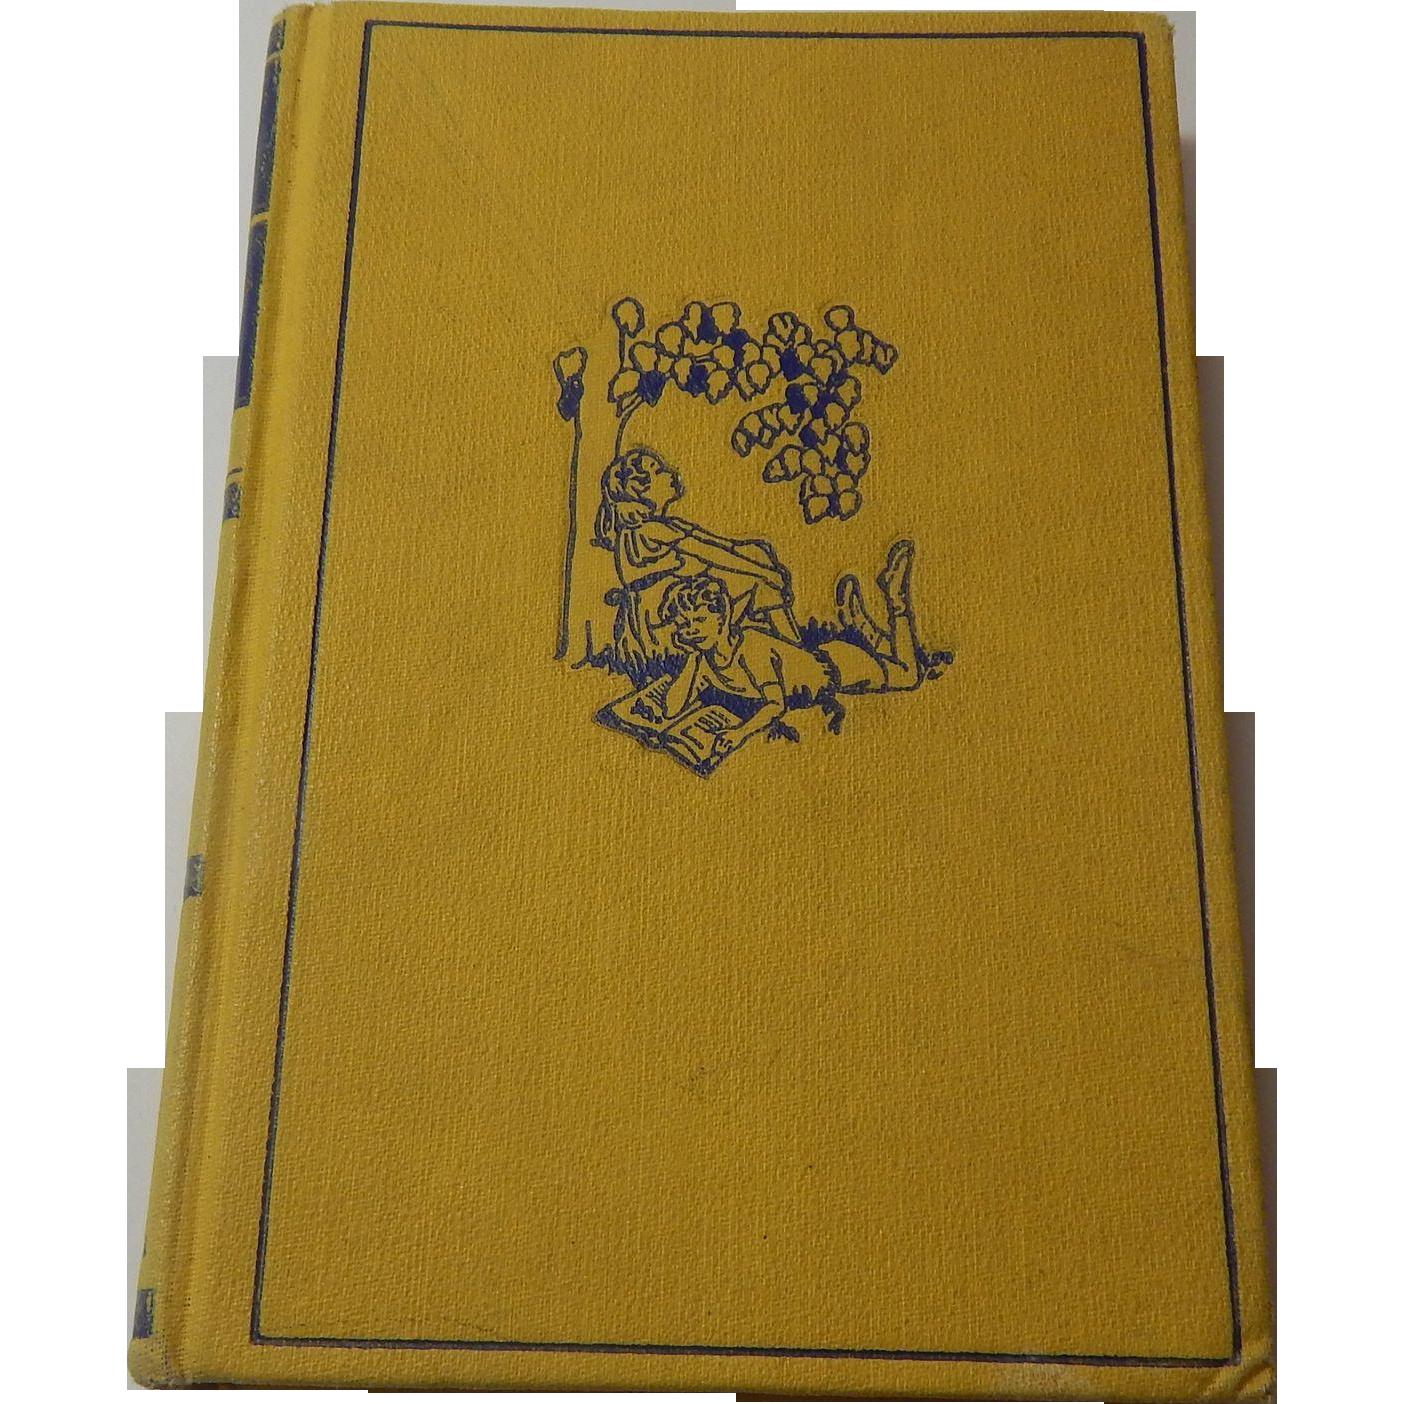 Alice In Wonderland by Lewis Carroll 1948